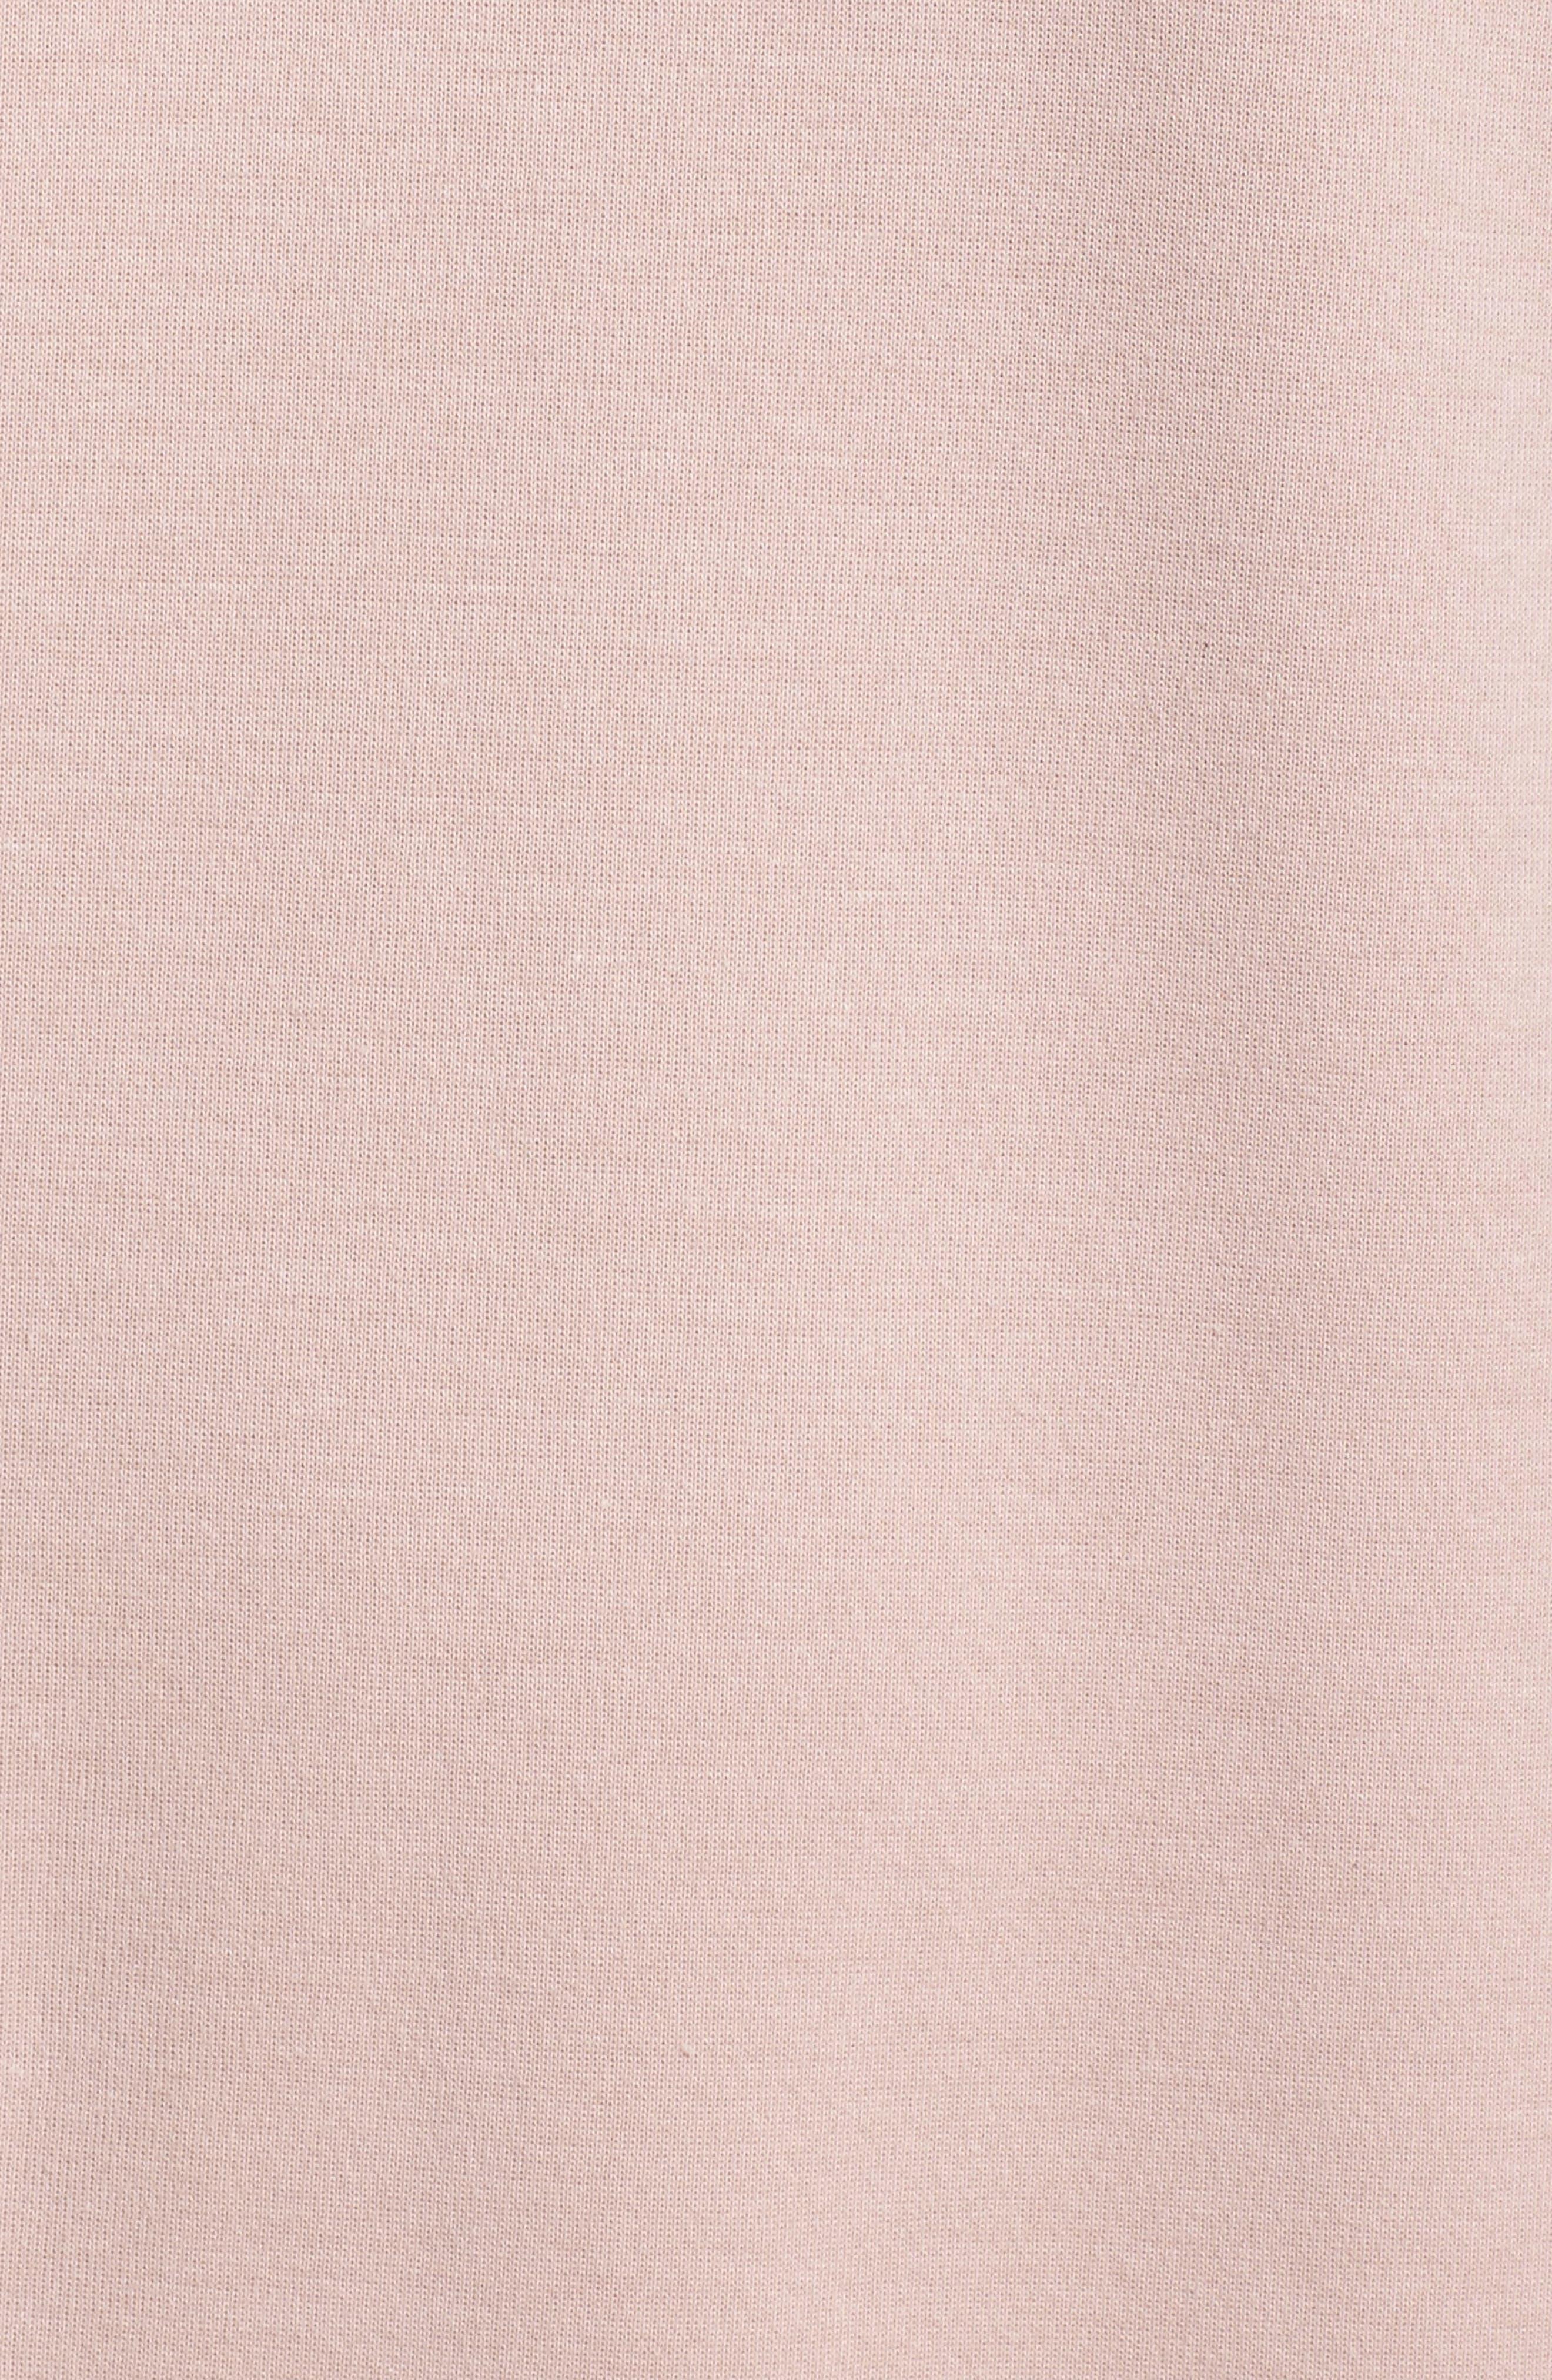 Oversized Sweatshirt,                             Alternate thumbnail 6, color,                             Shell Pink